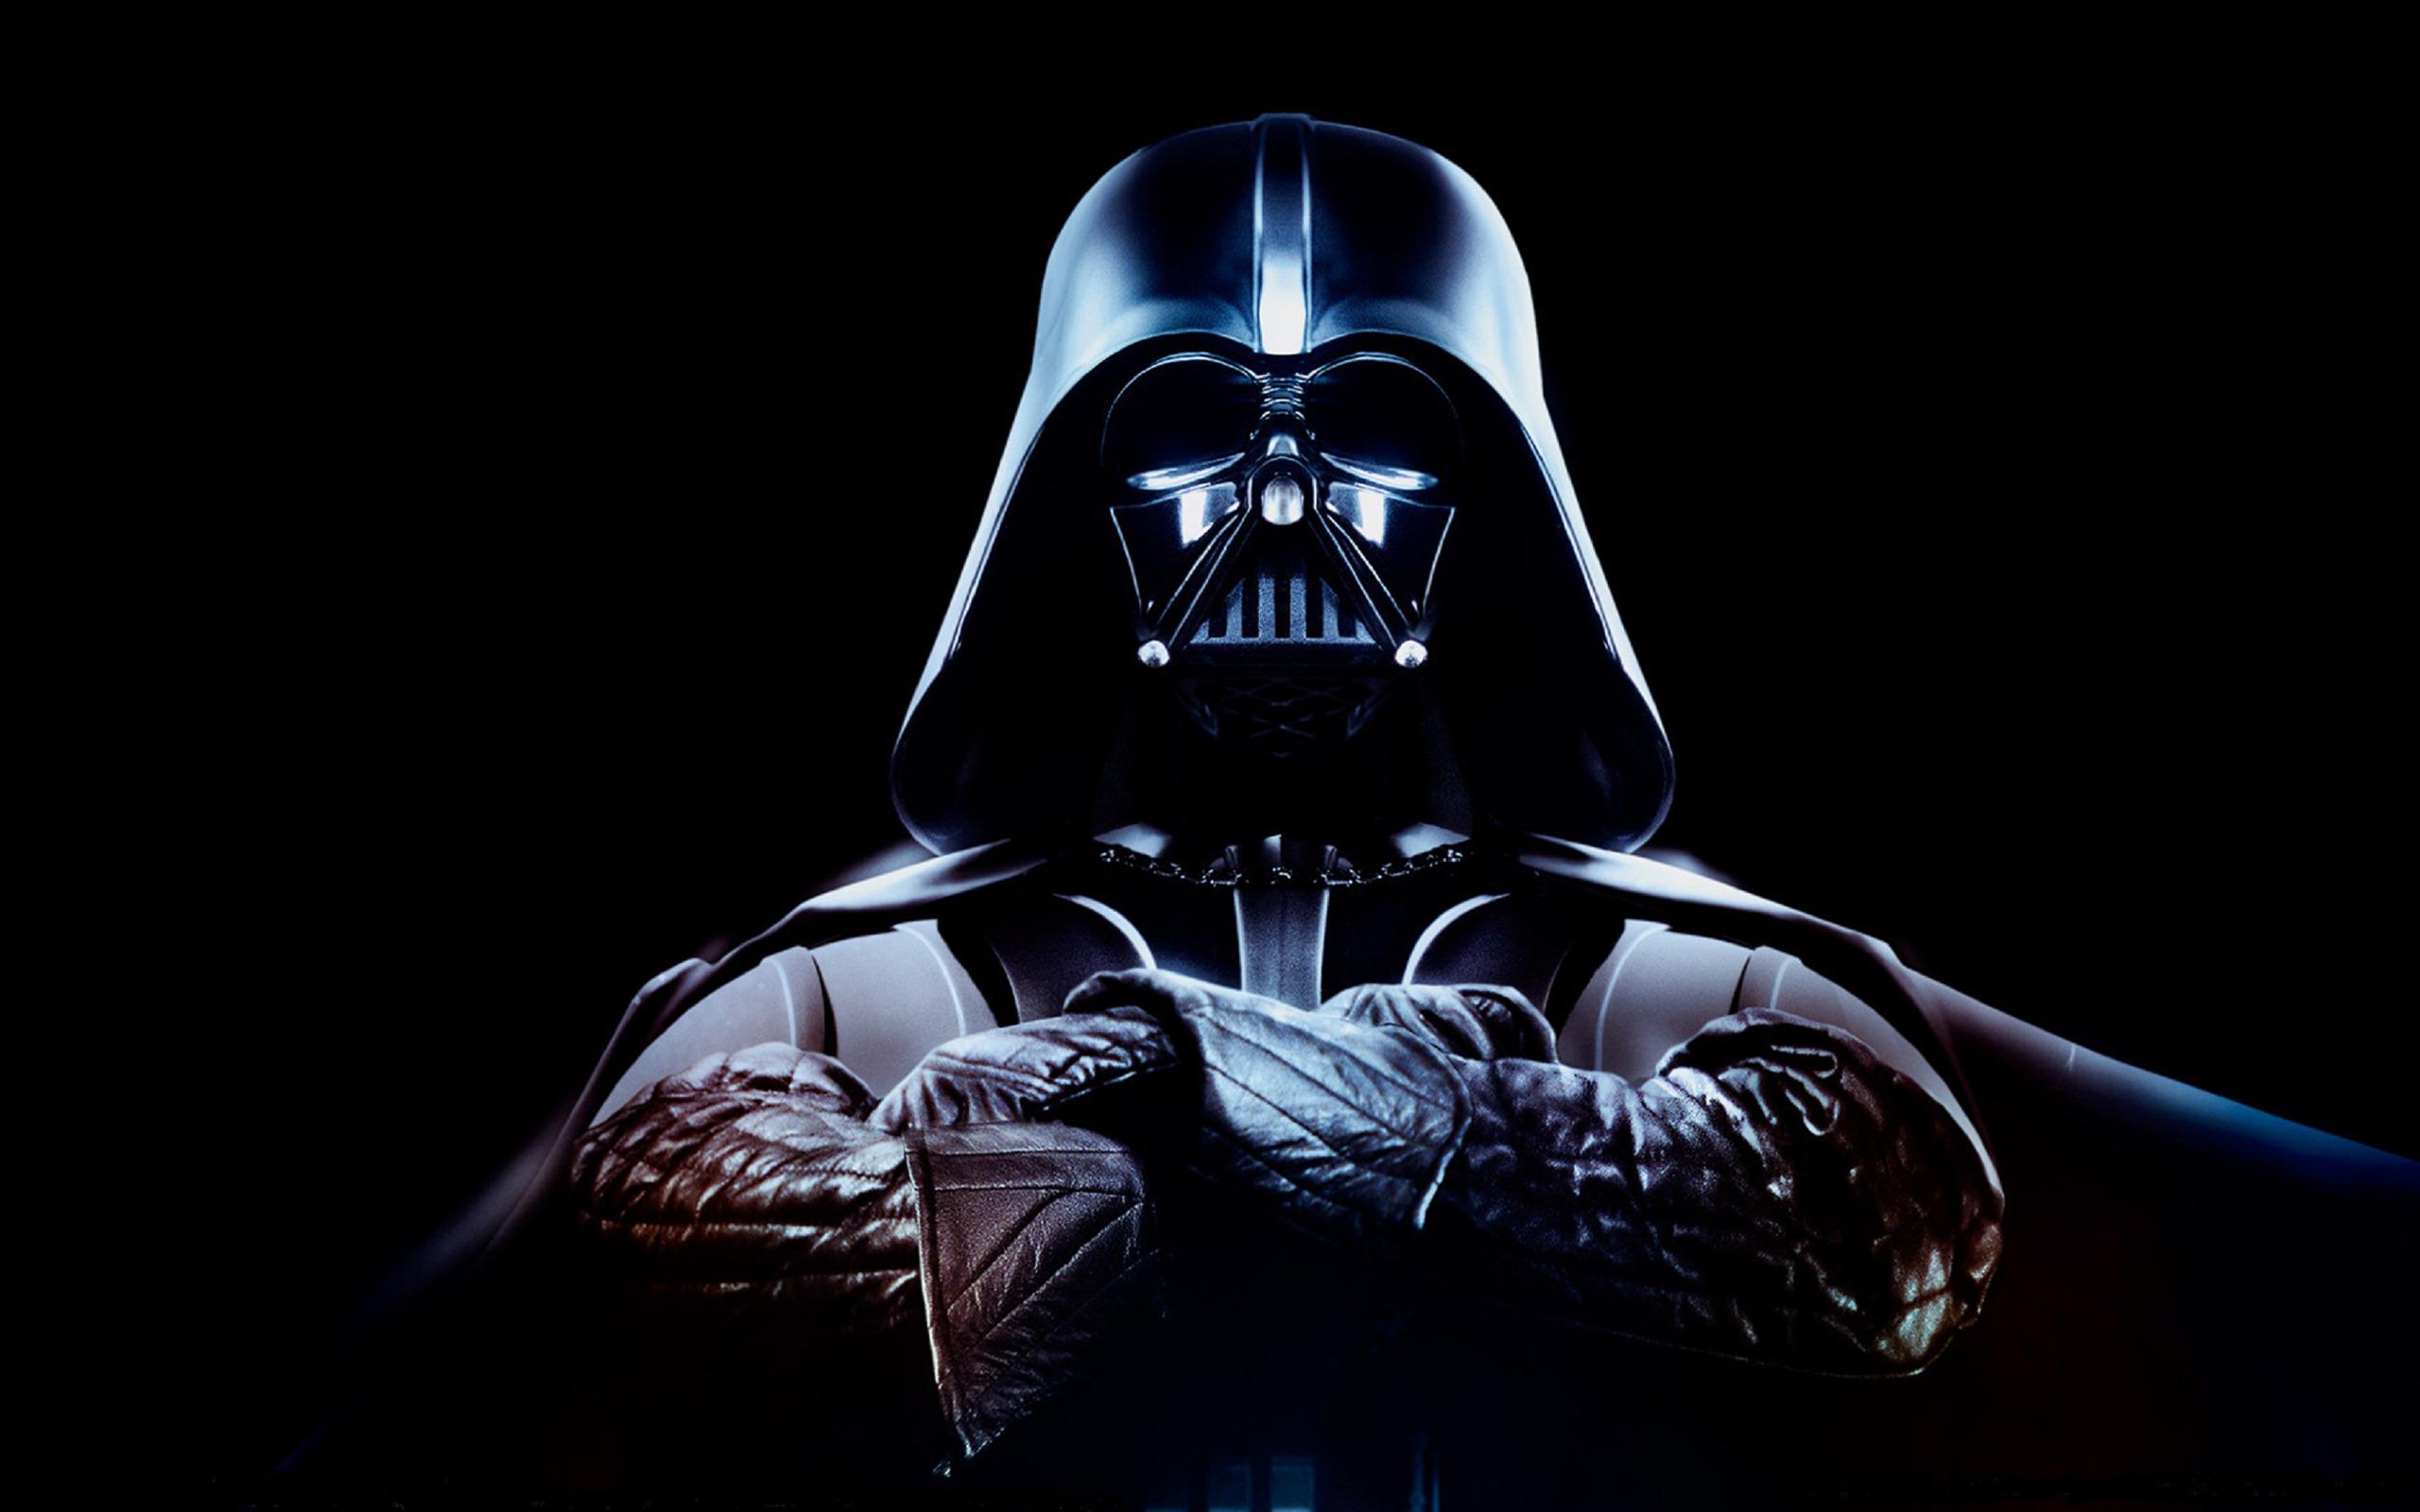 ... Darth Vader Wallpaper · Darth Vader Wallpaper